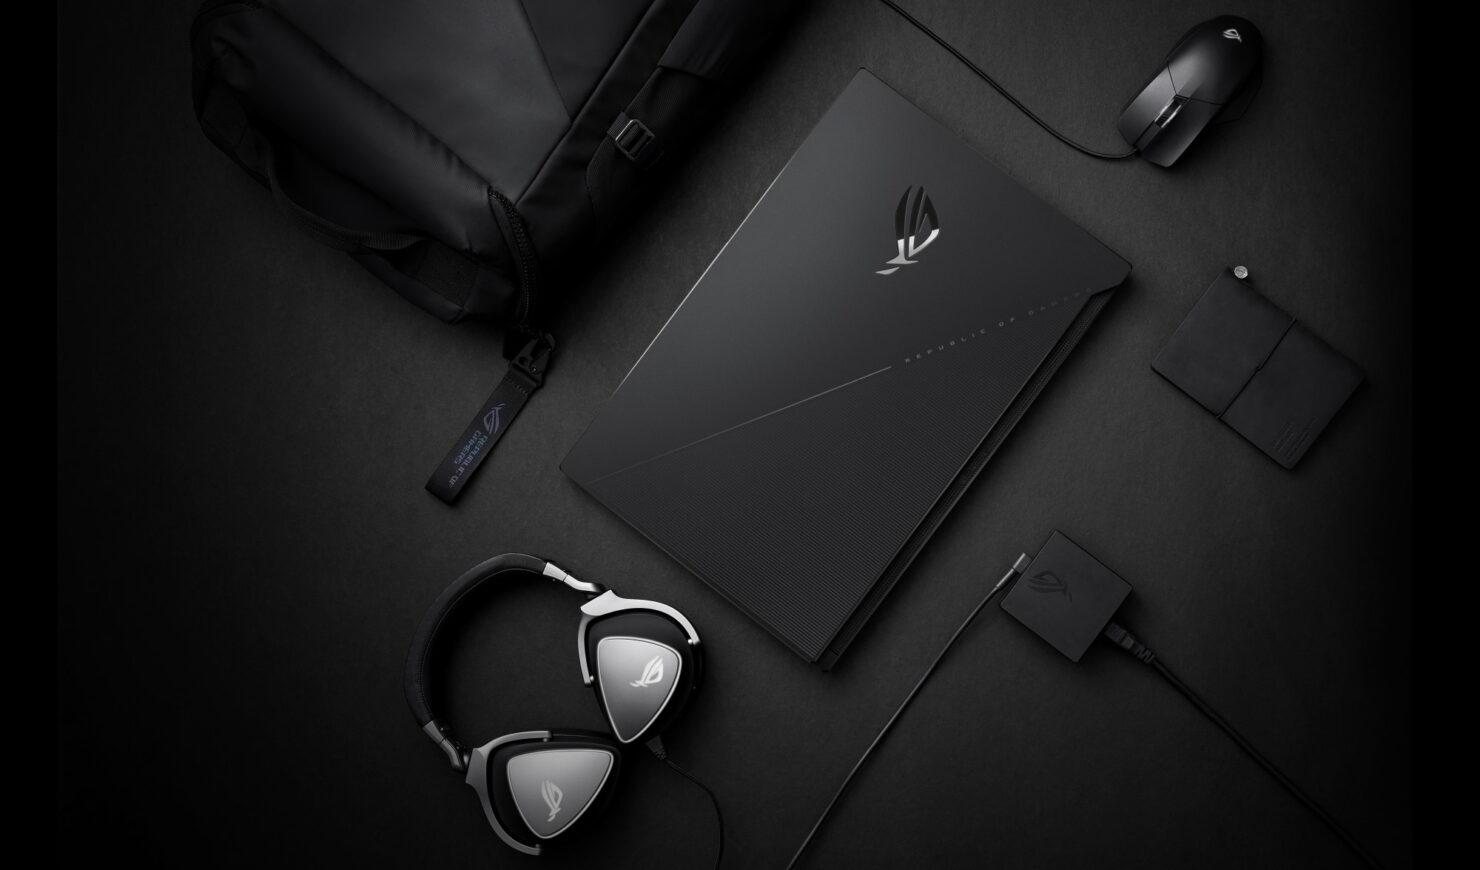 asus-rog-zephyrus-s17-gaming-laptop-_2